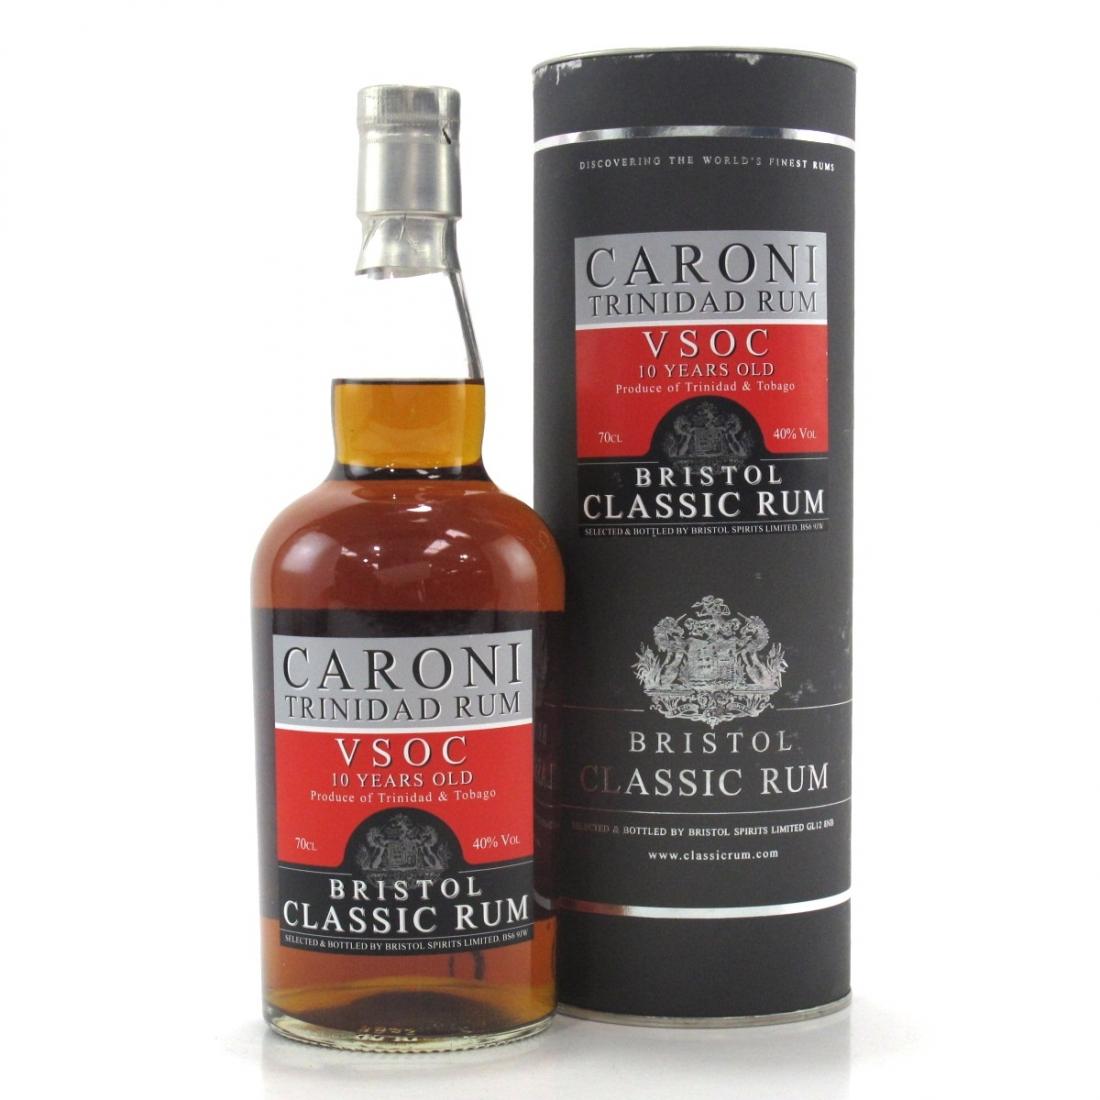 Caroni 10 Year Old Bristol Classic Rum / VSOC